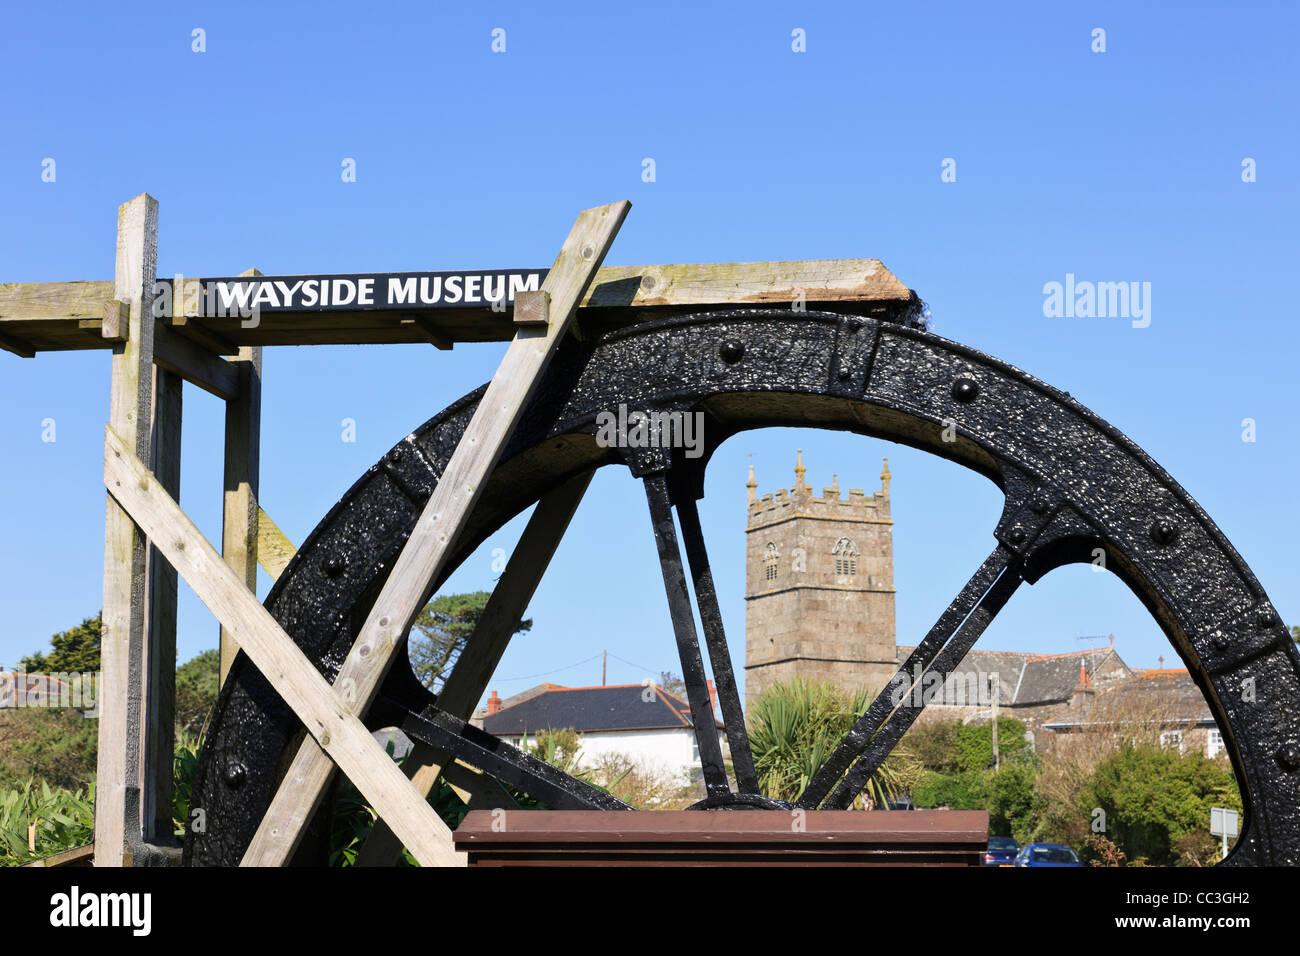 Zennor Cornwall England UK. Trewey Mill working water wheel outside Wayside Museum with village church of St Senara - Stock Image